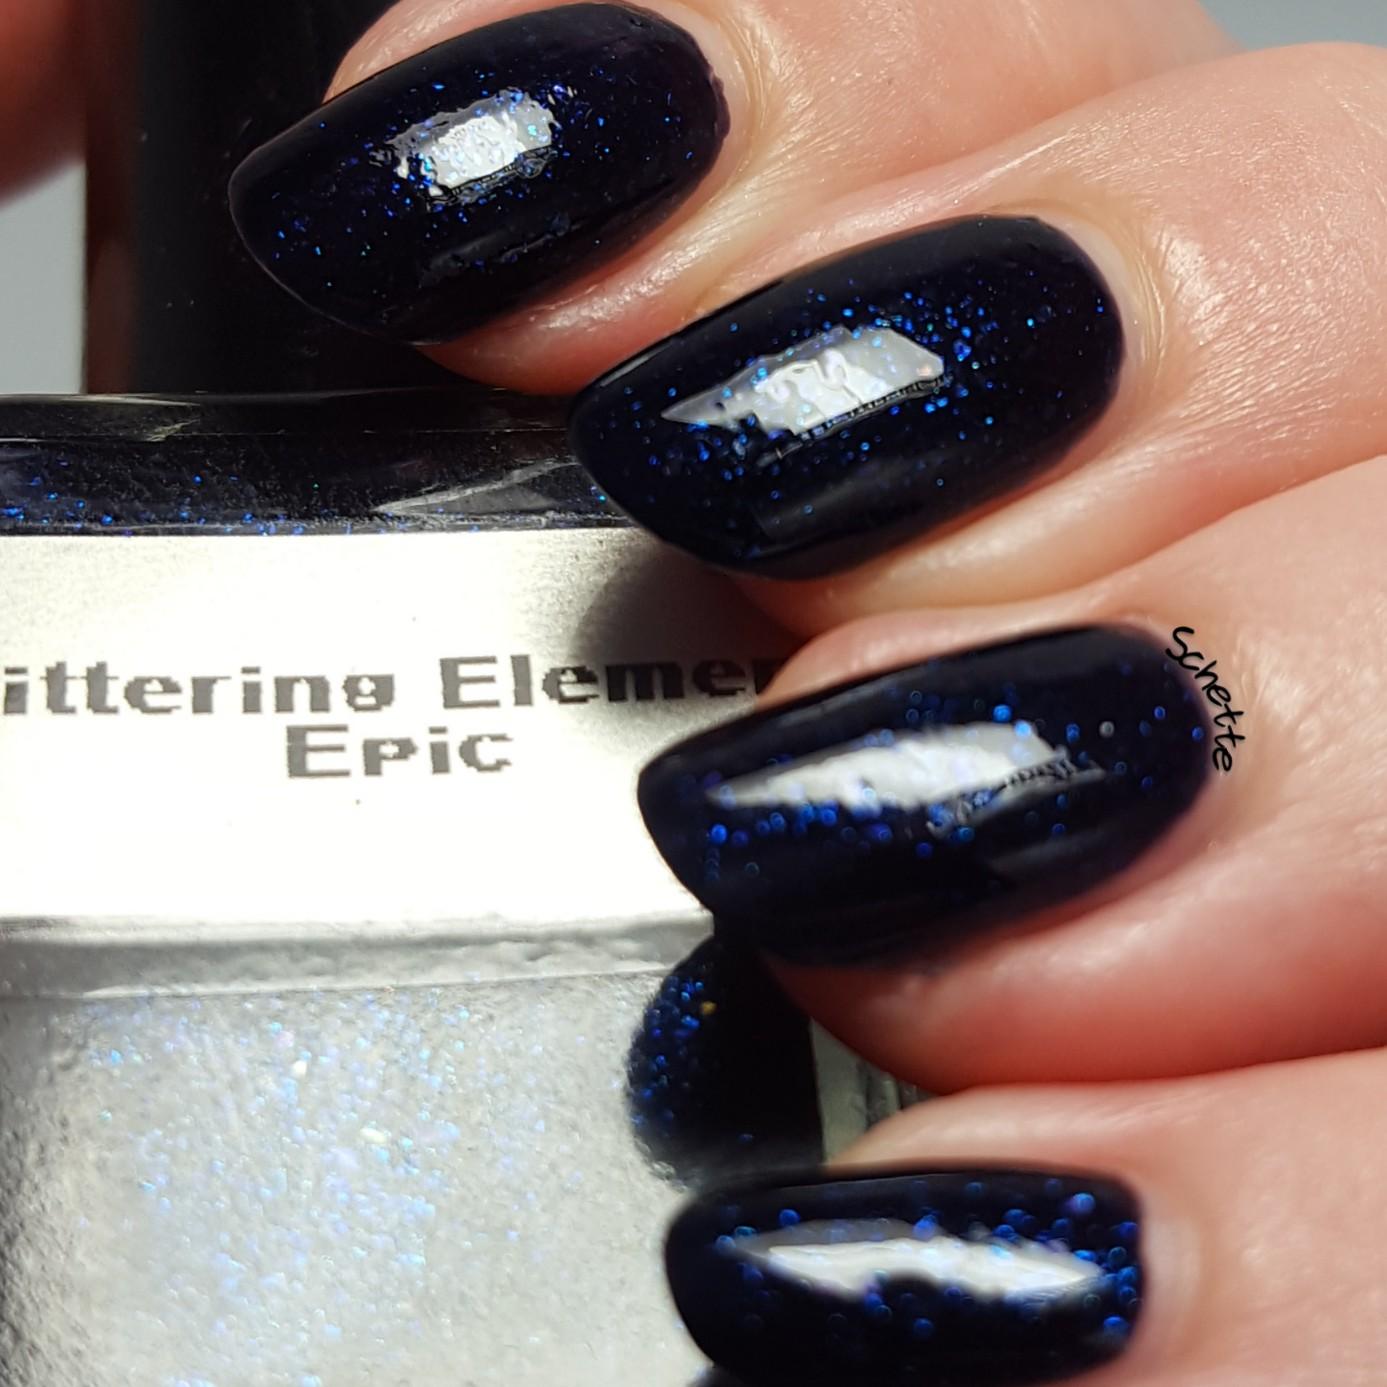 Glittering Elements - Epic